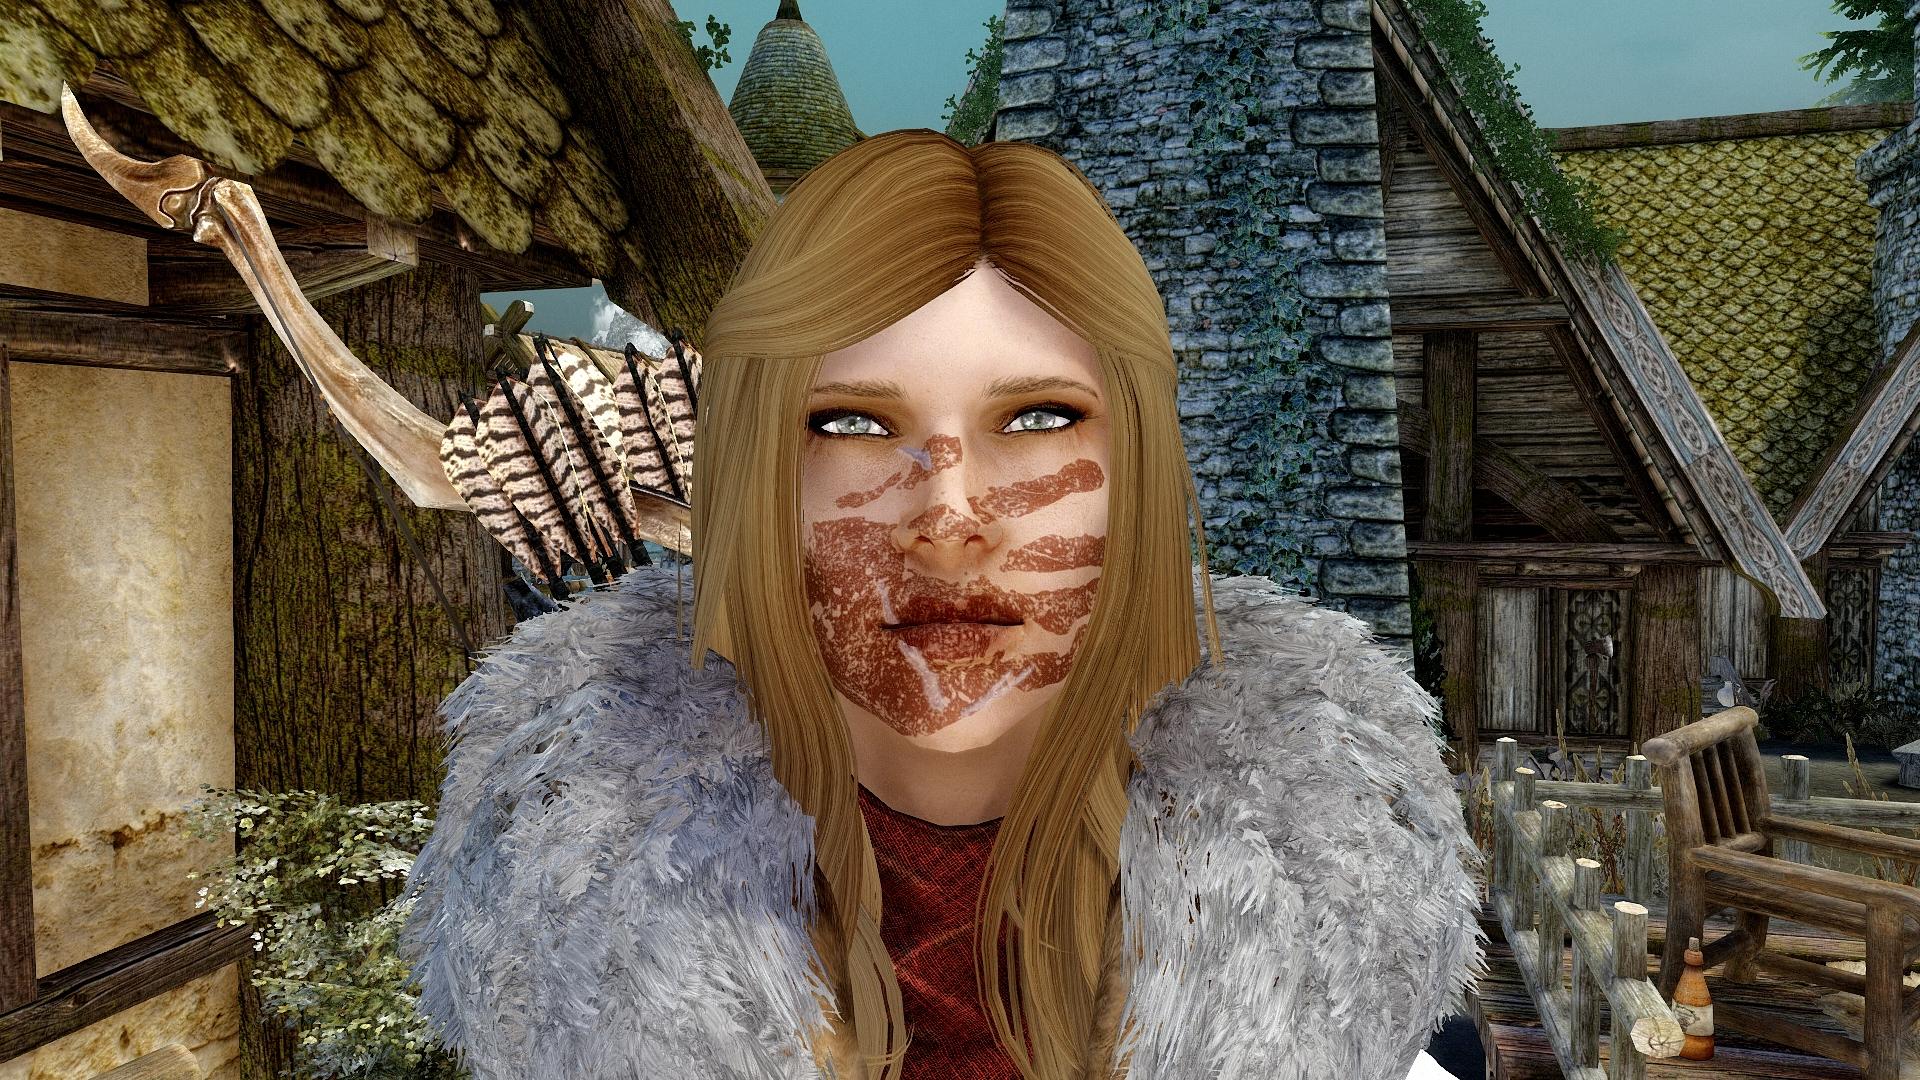 Elder Scrolls V Skyrim Screenshot 2017.11.30 - 06.59.43.90